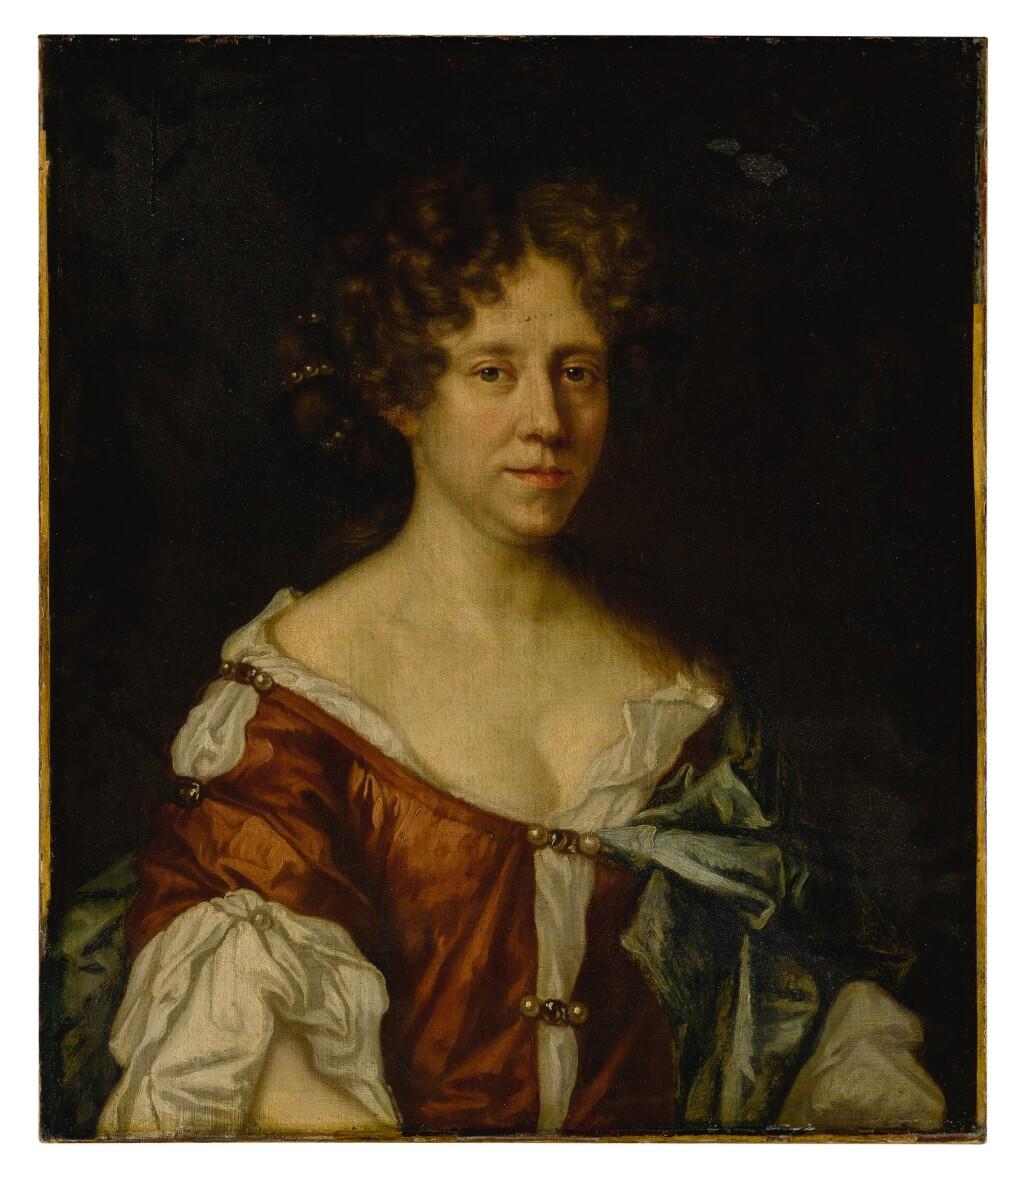 BRITISH SCHOOL, 17TH CENTURY   PORTRAIT OF A LADY, HALF LENGTH